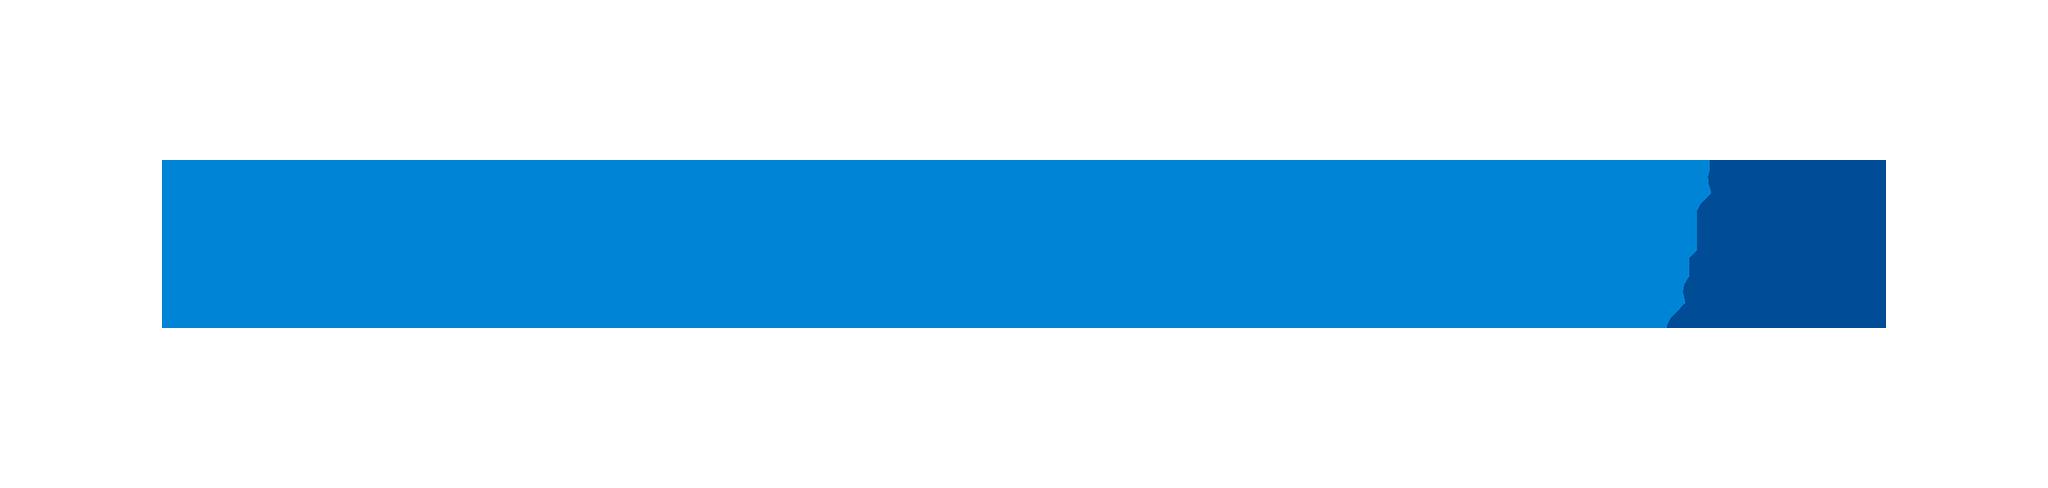 SPX Logos | SPX Corporation in Charlotte, NC